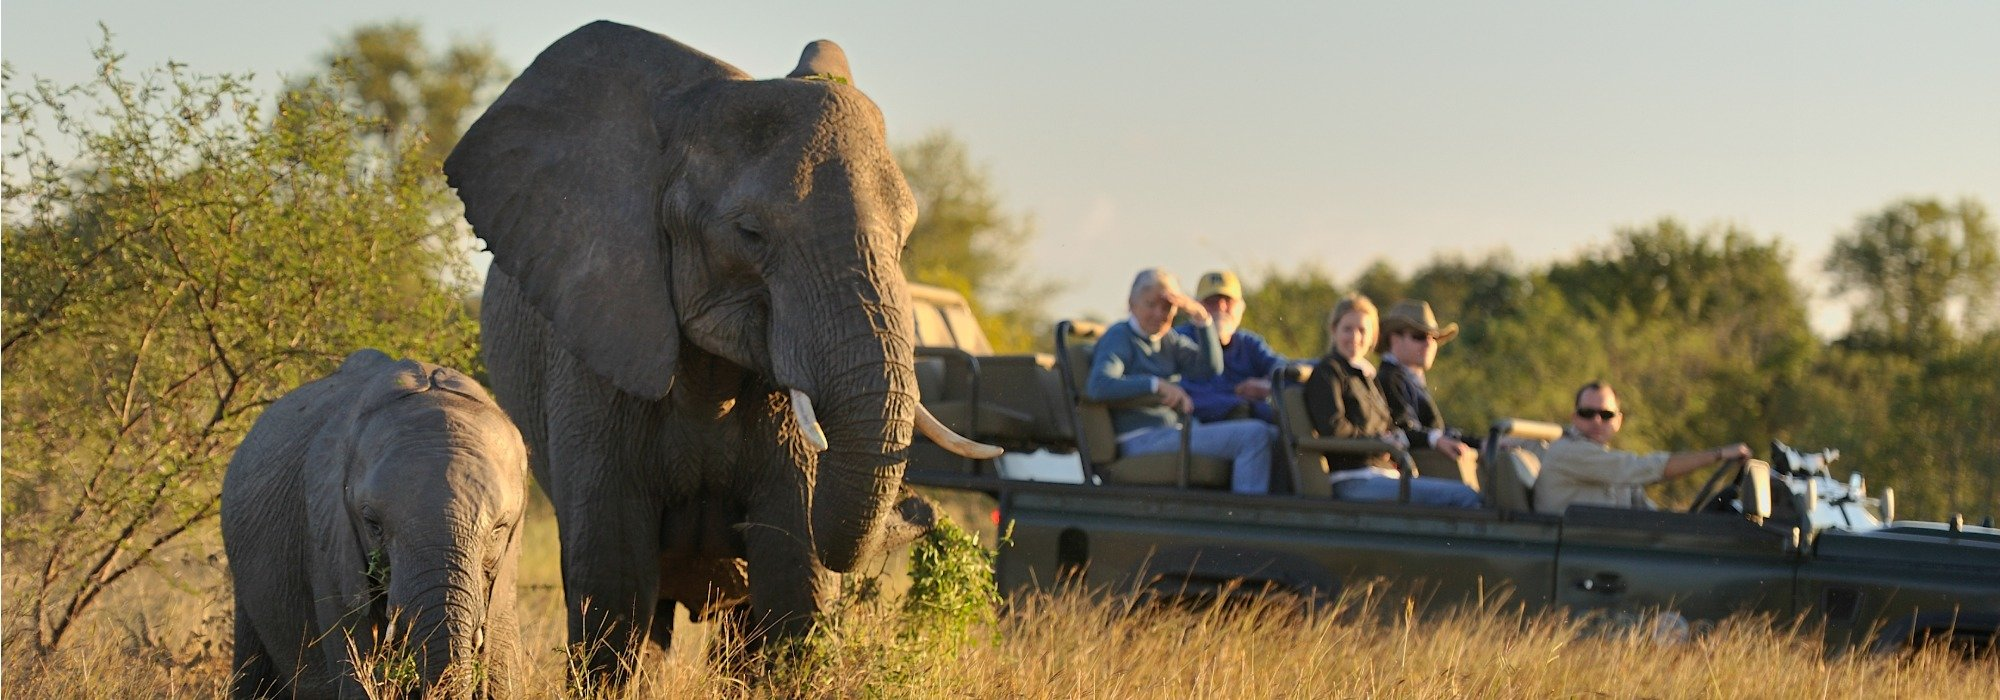 Elephants on safari at Sabi Sabi